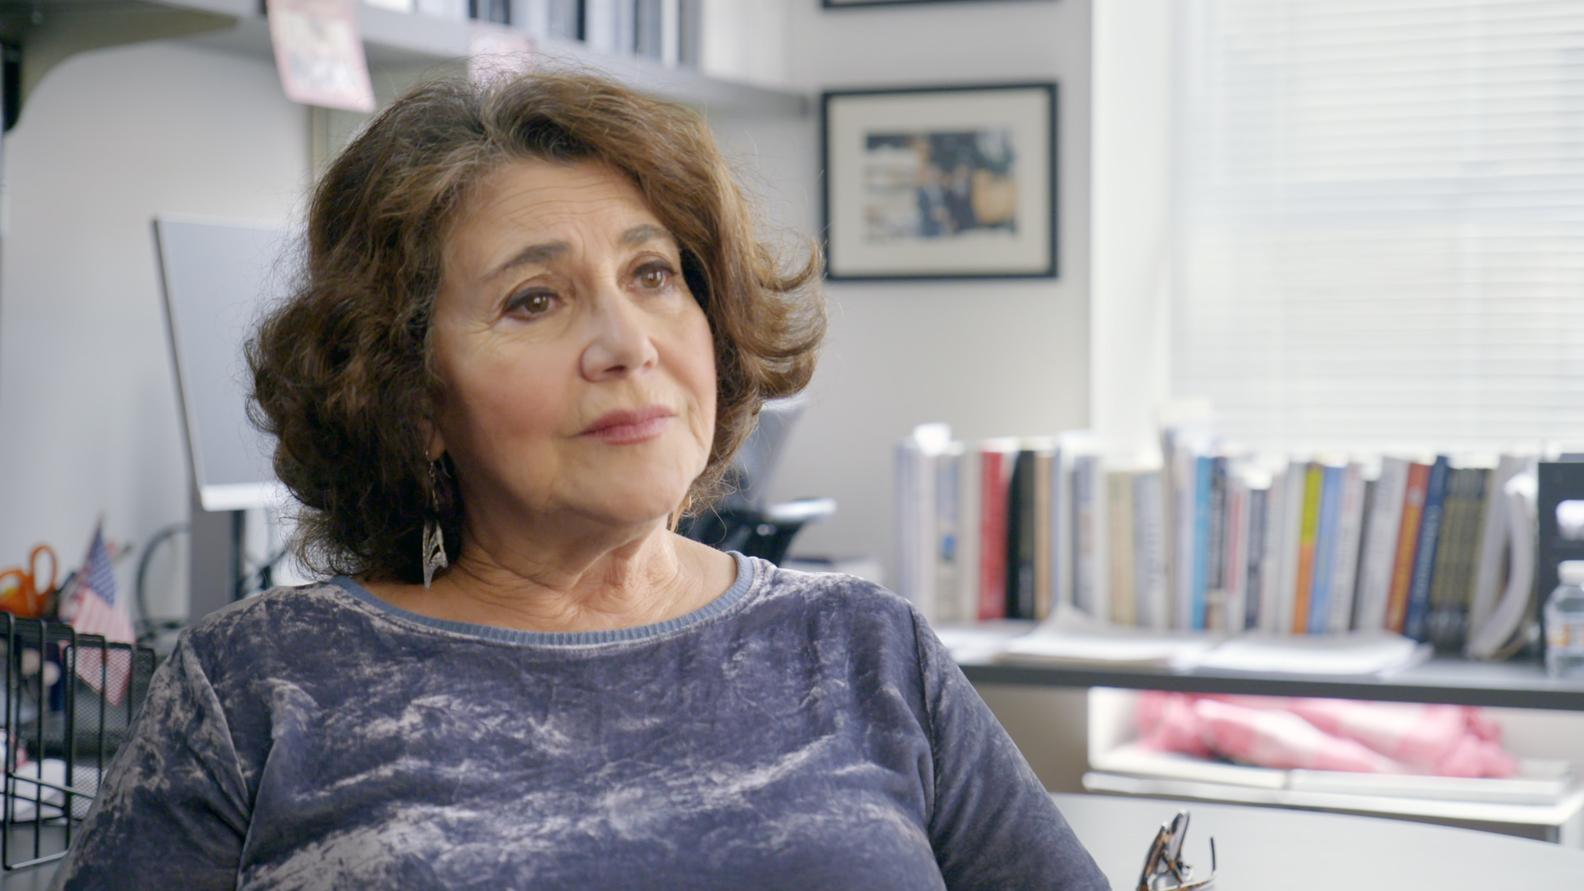 Brookings Institution expert Elaine Kamarck